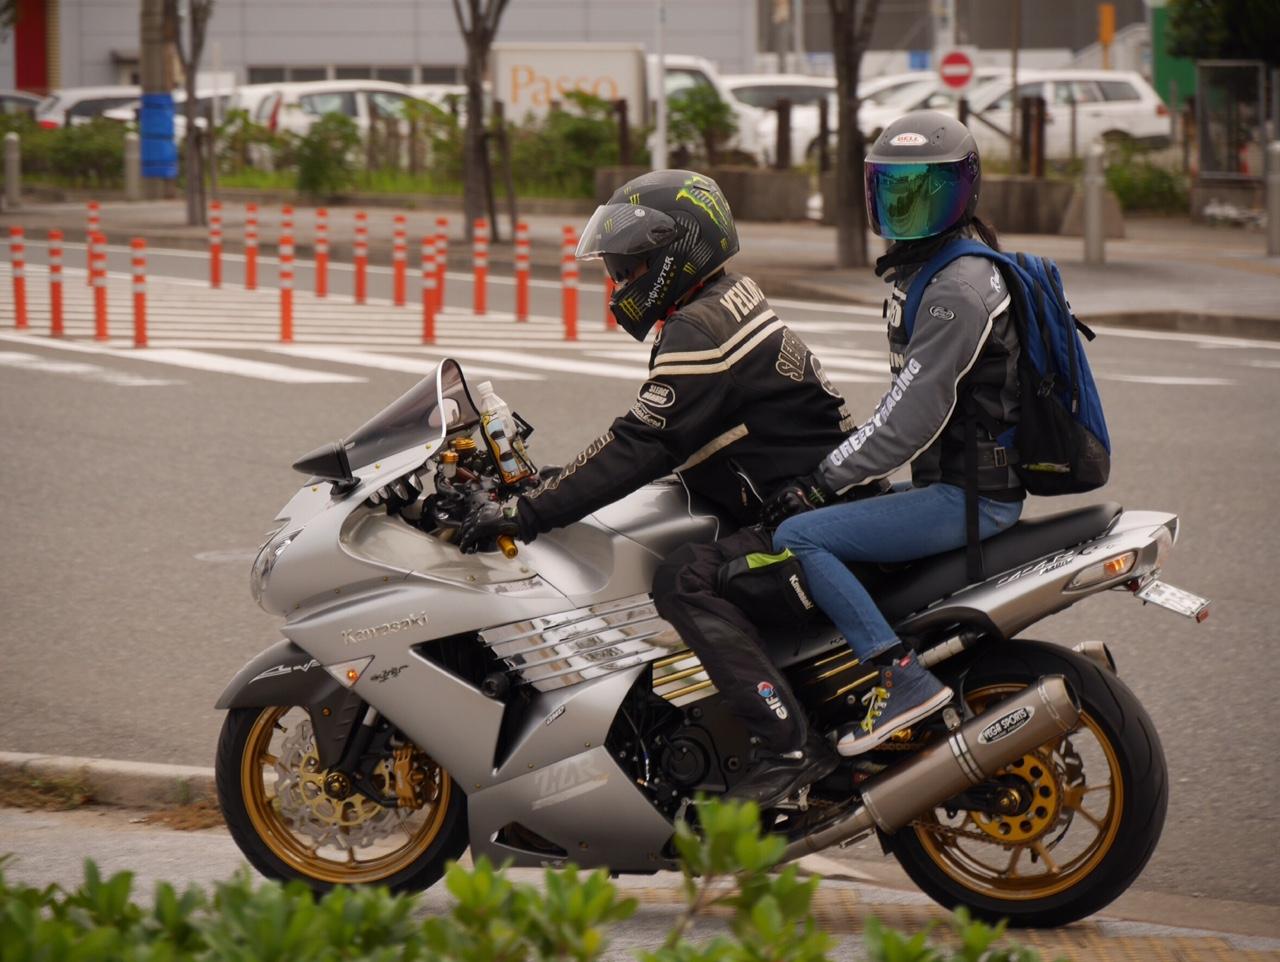 IMG_3987.jpg